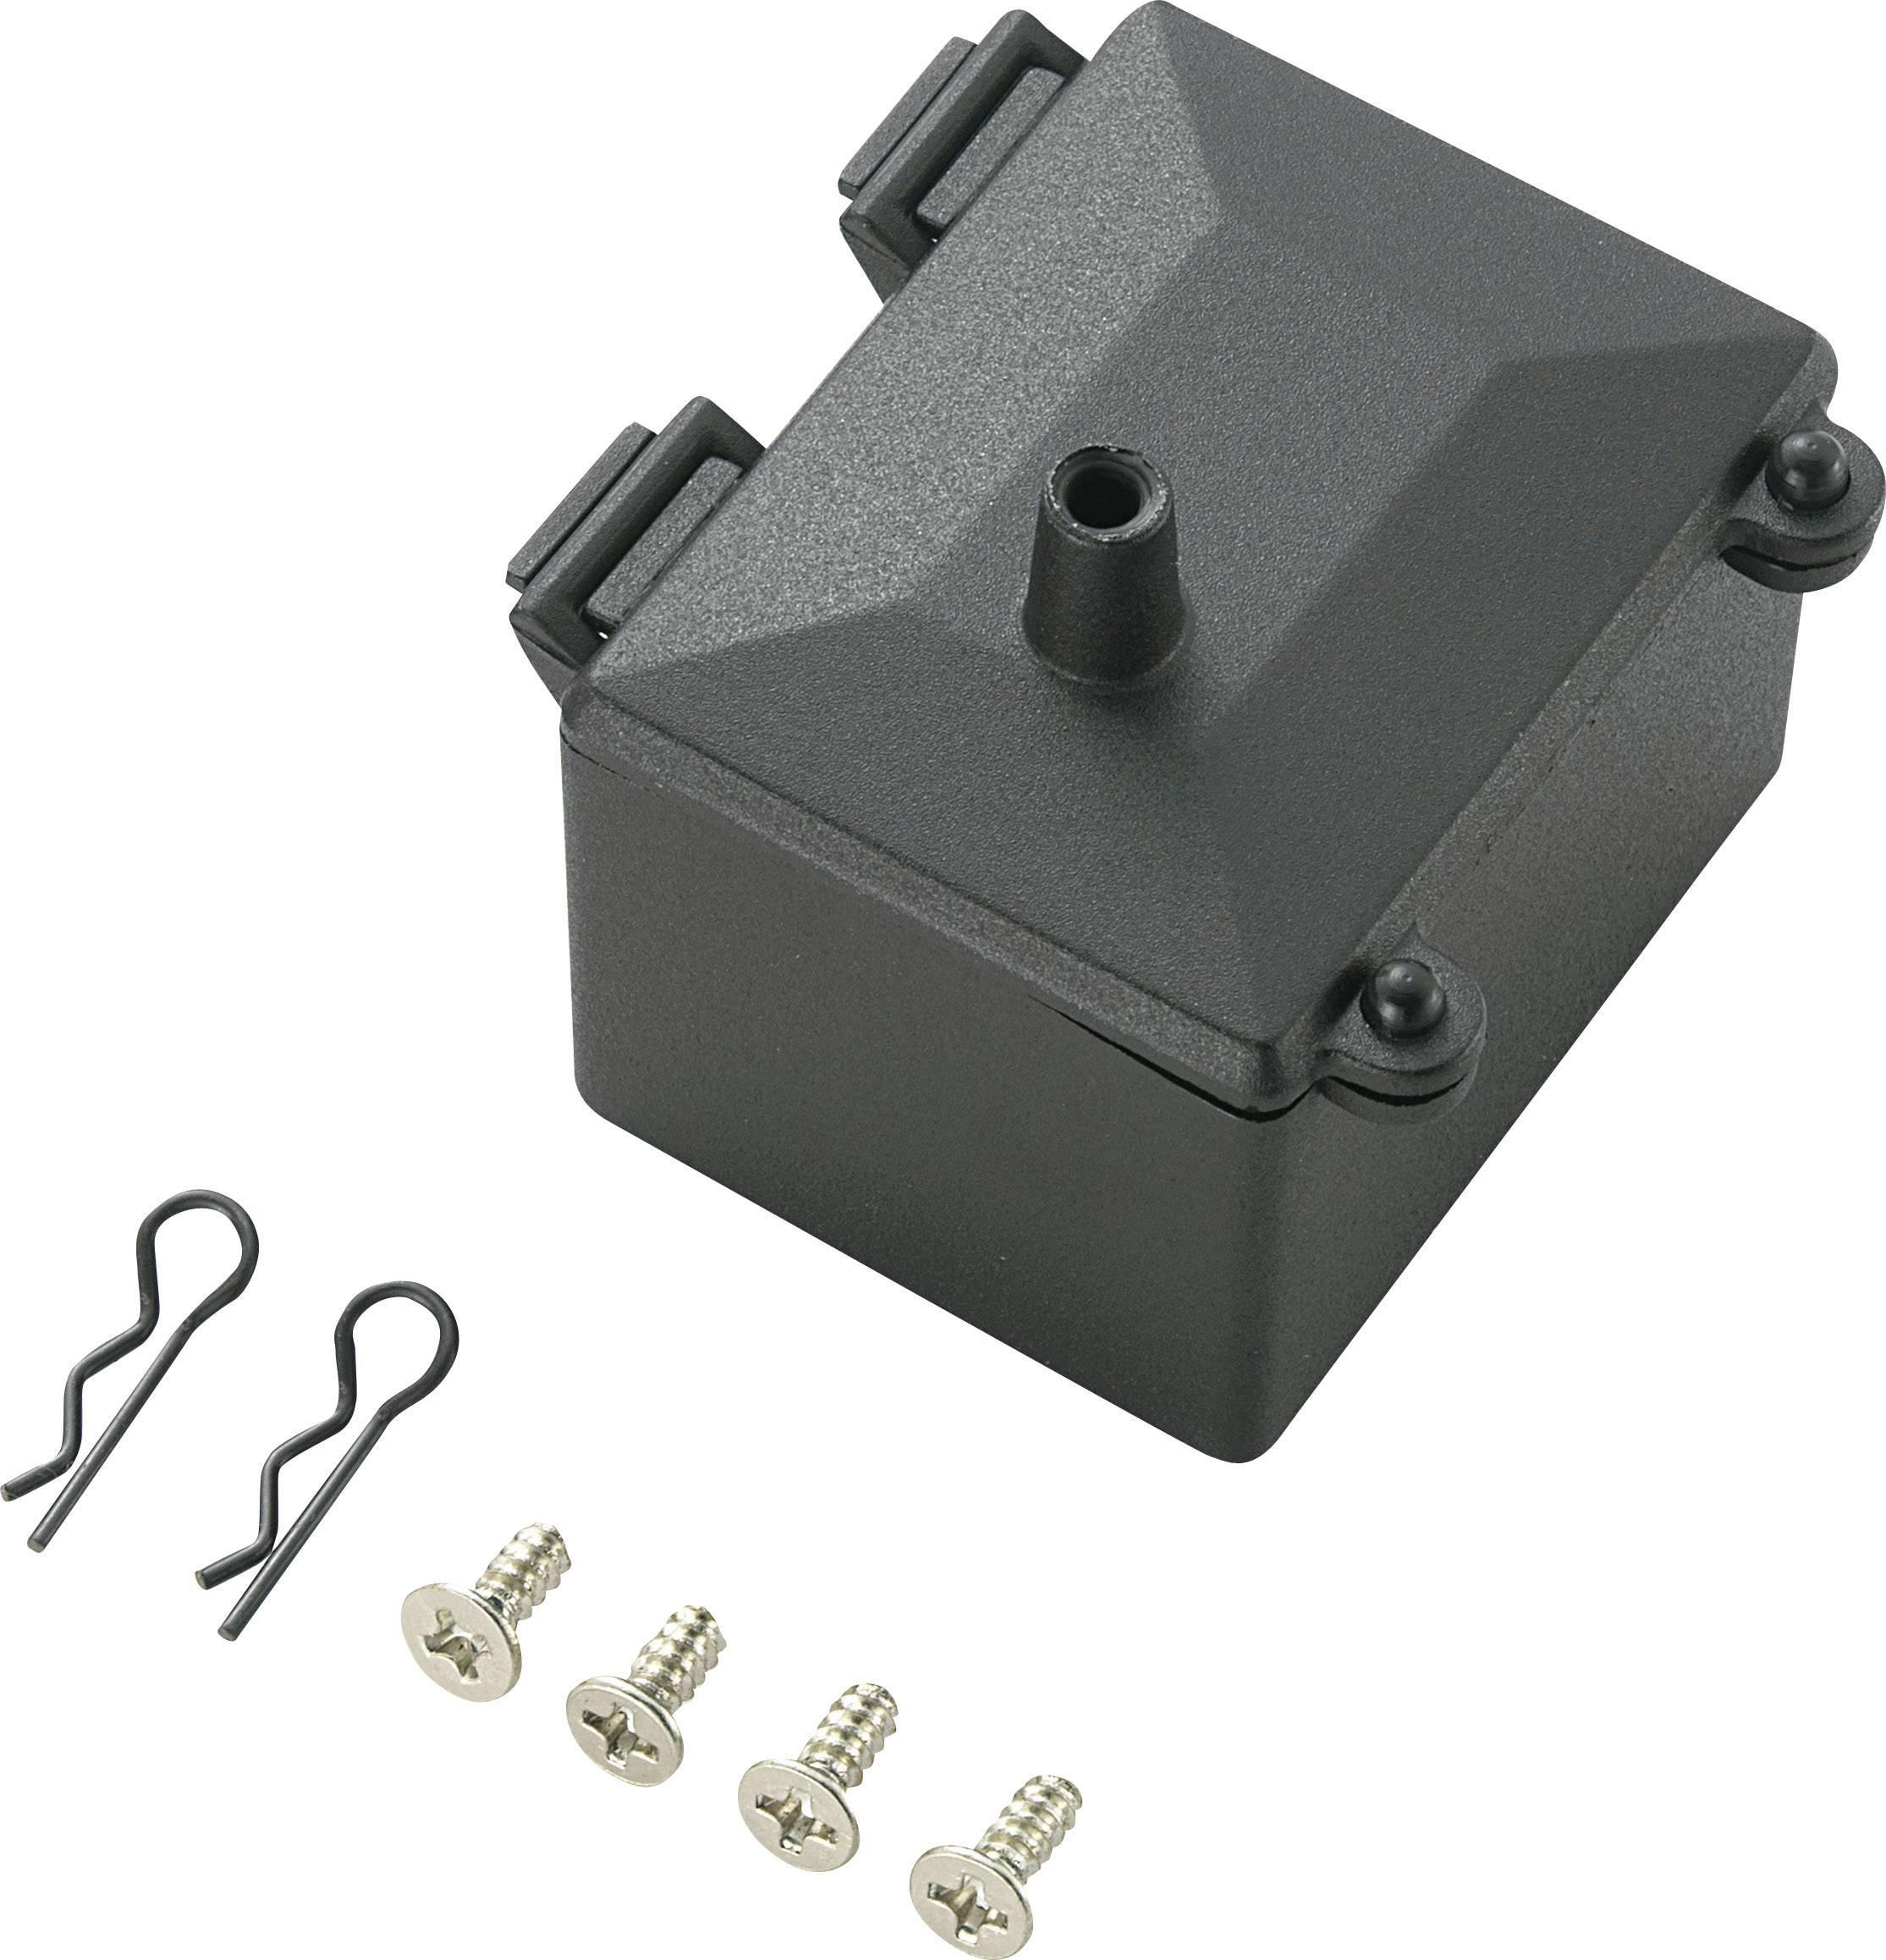 Krabička přijímače Reely (511667C)